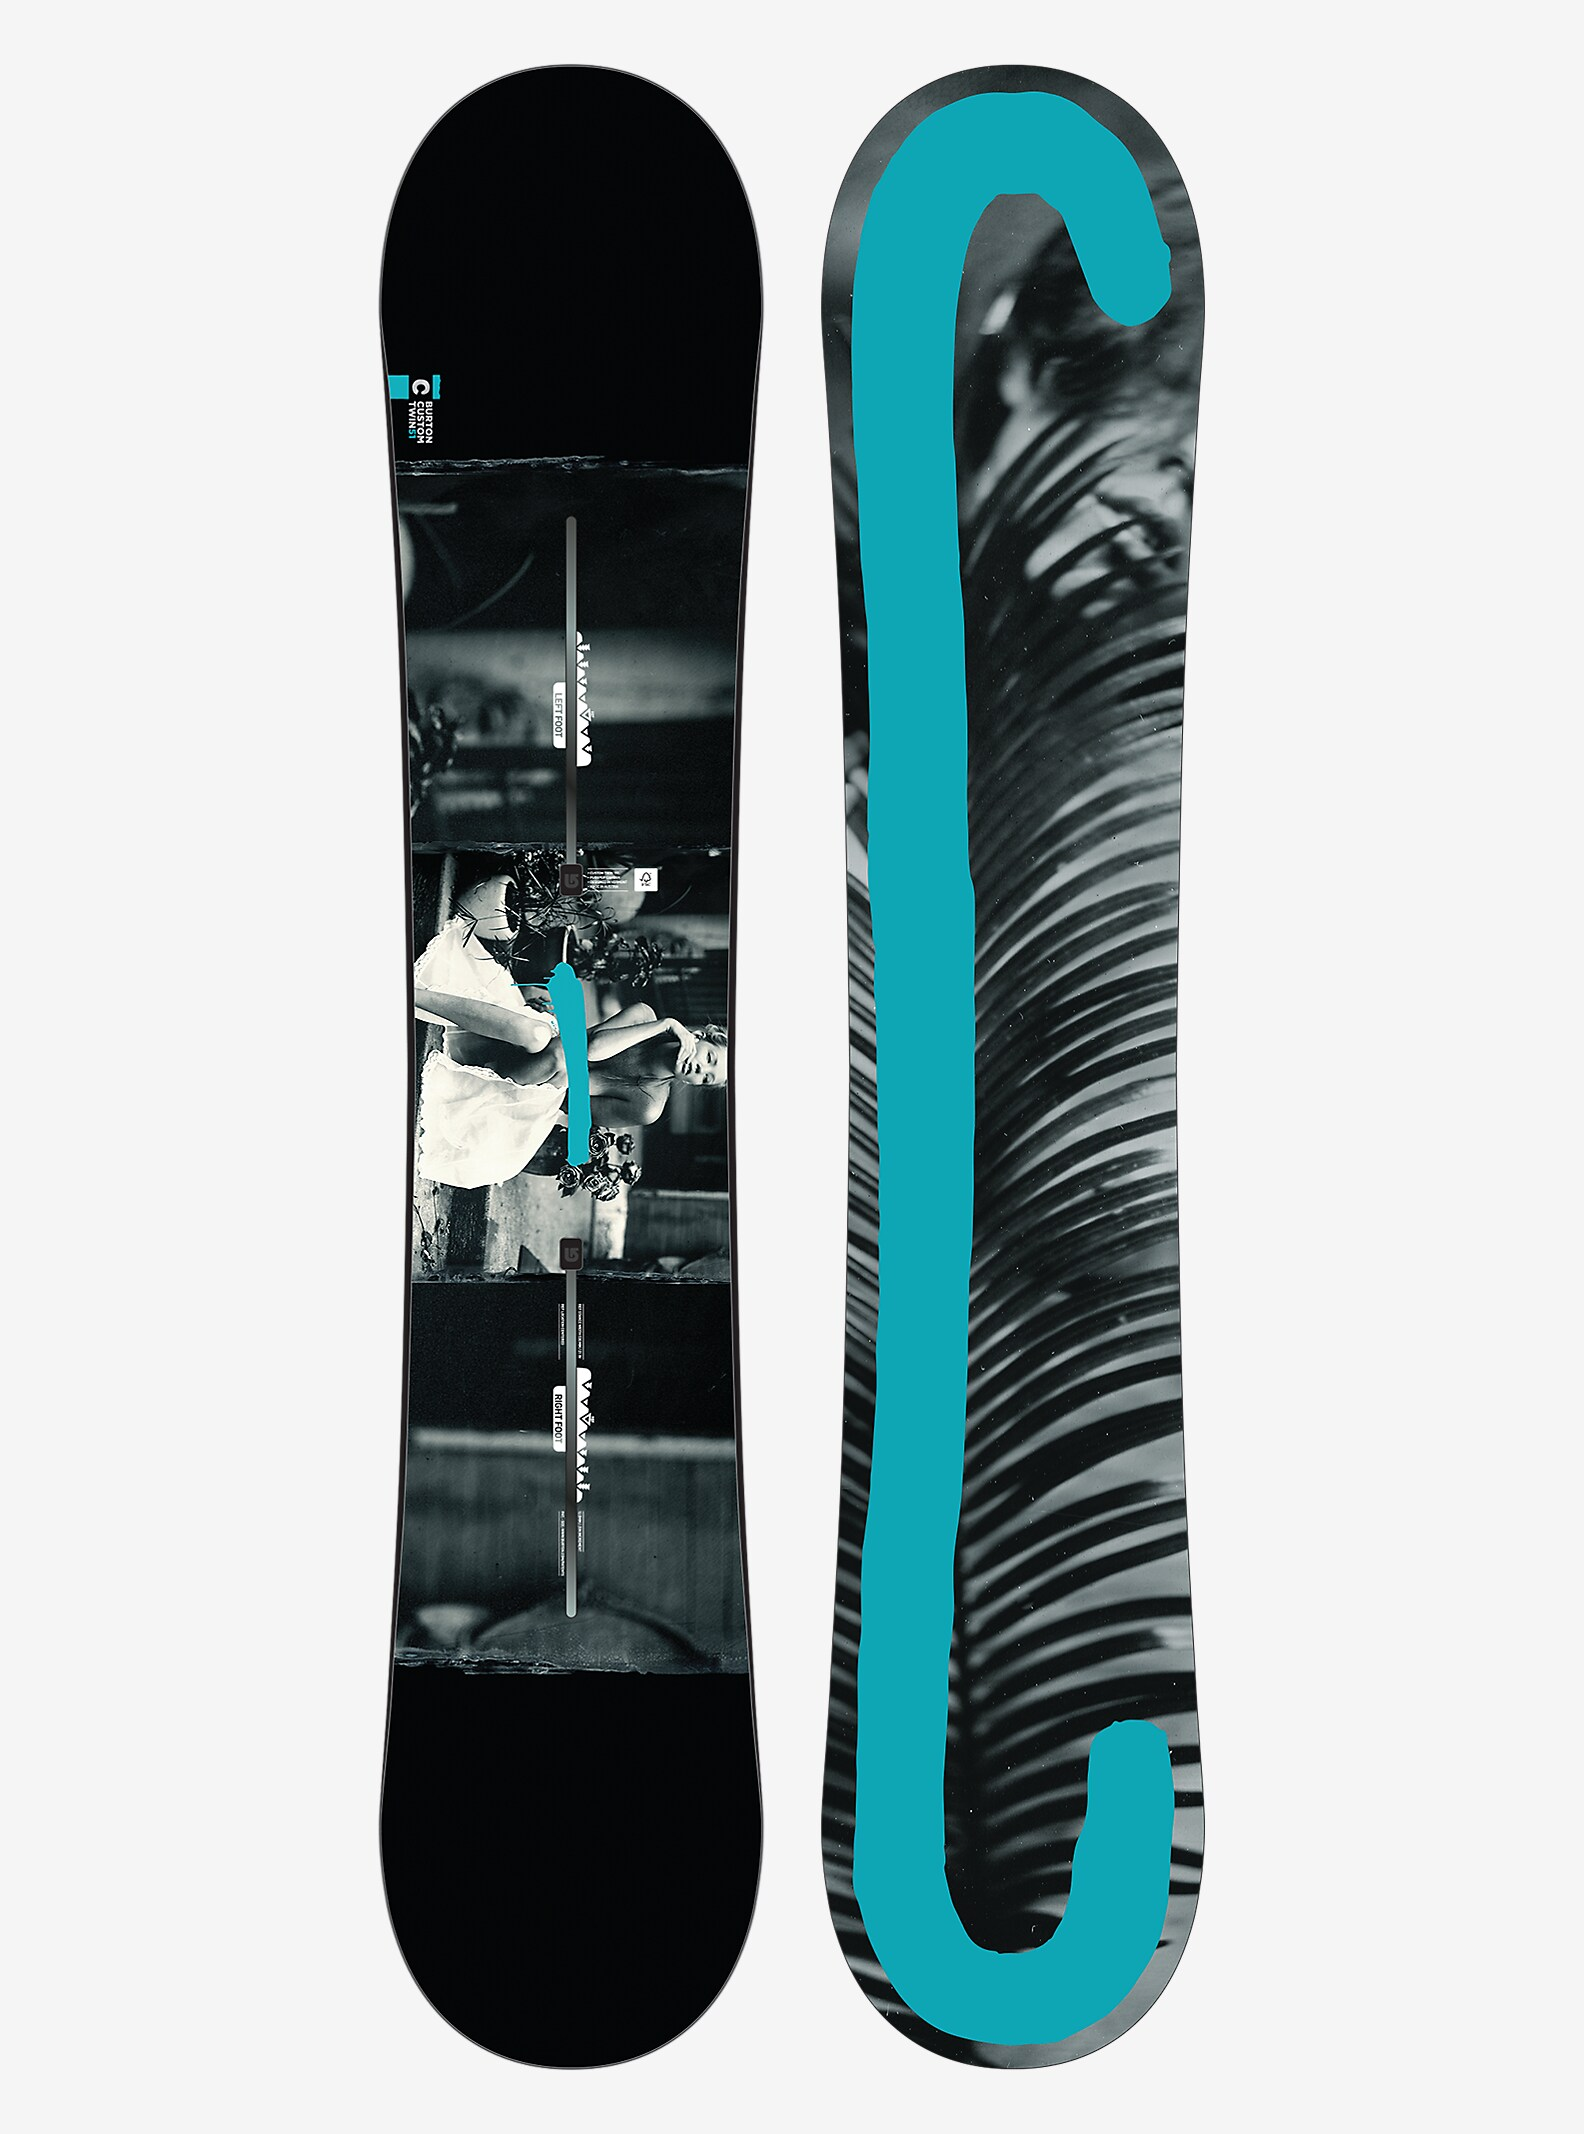 Burton Custom Twin Snowboard shown in 151